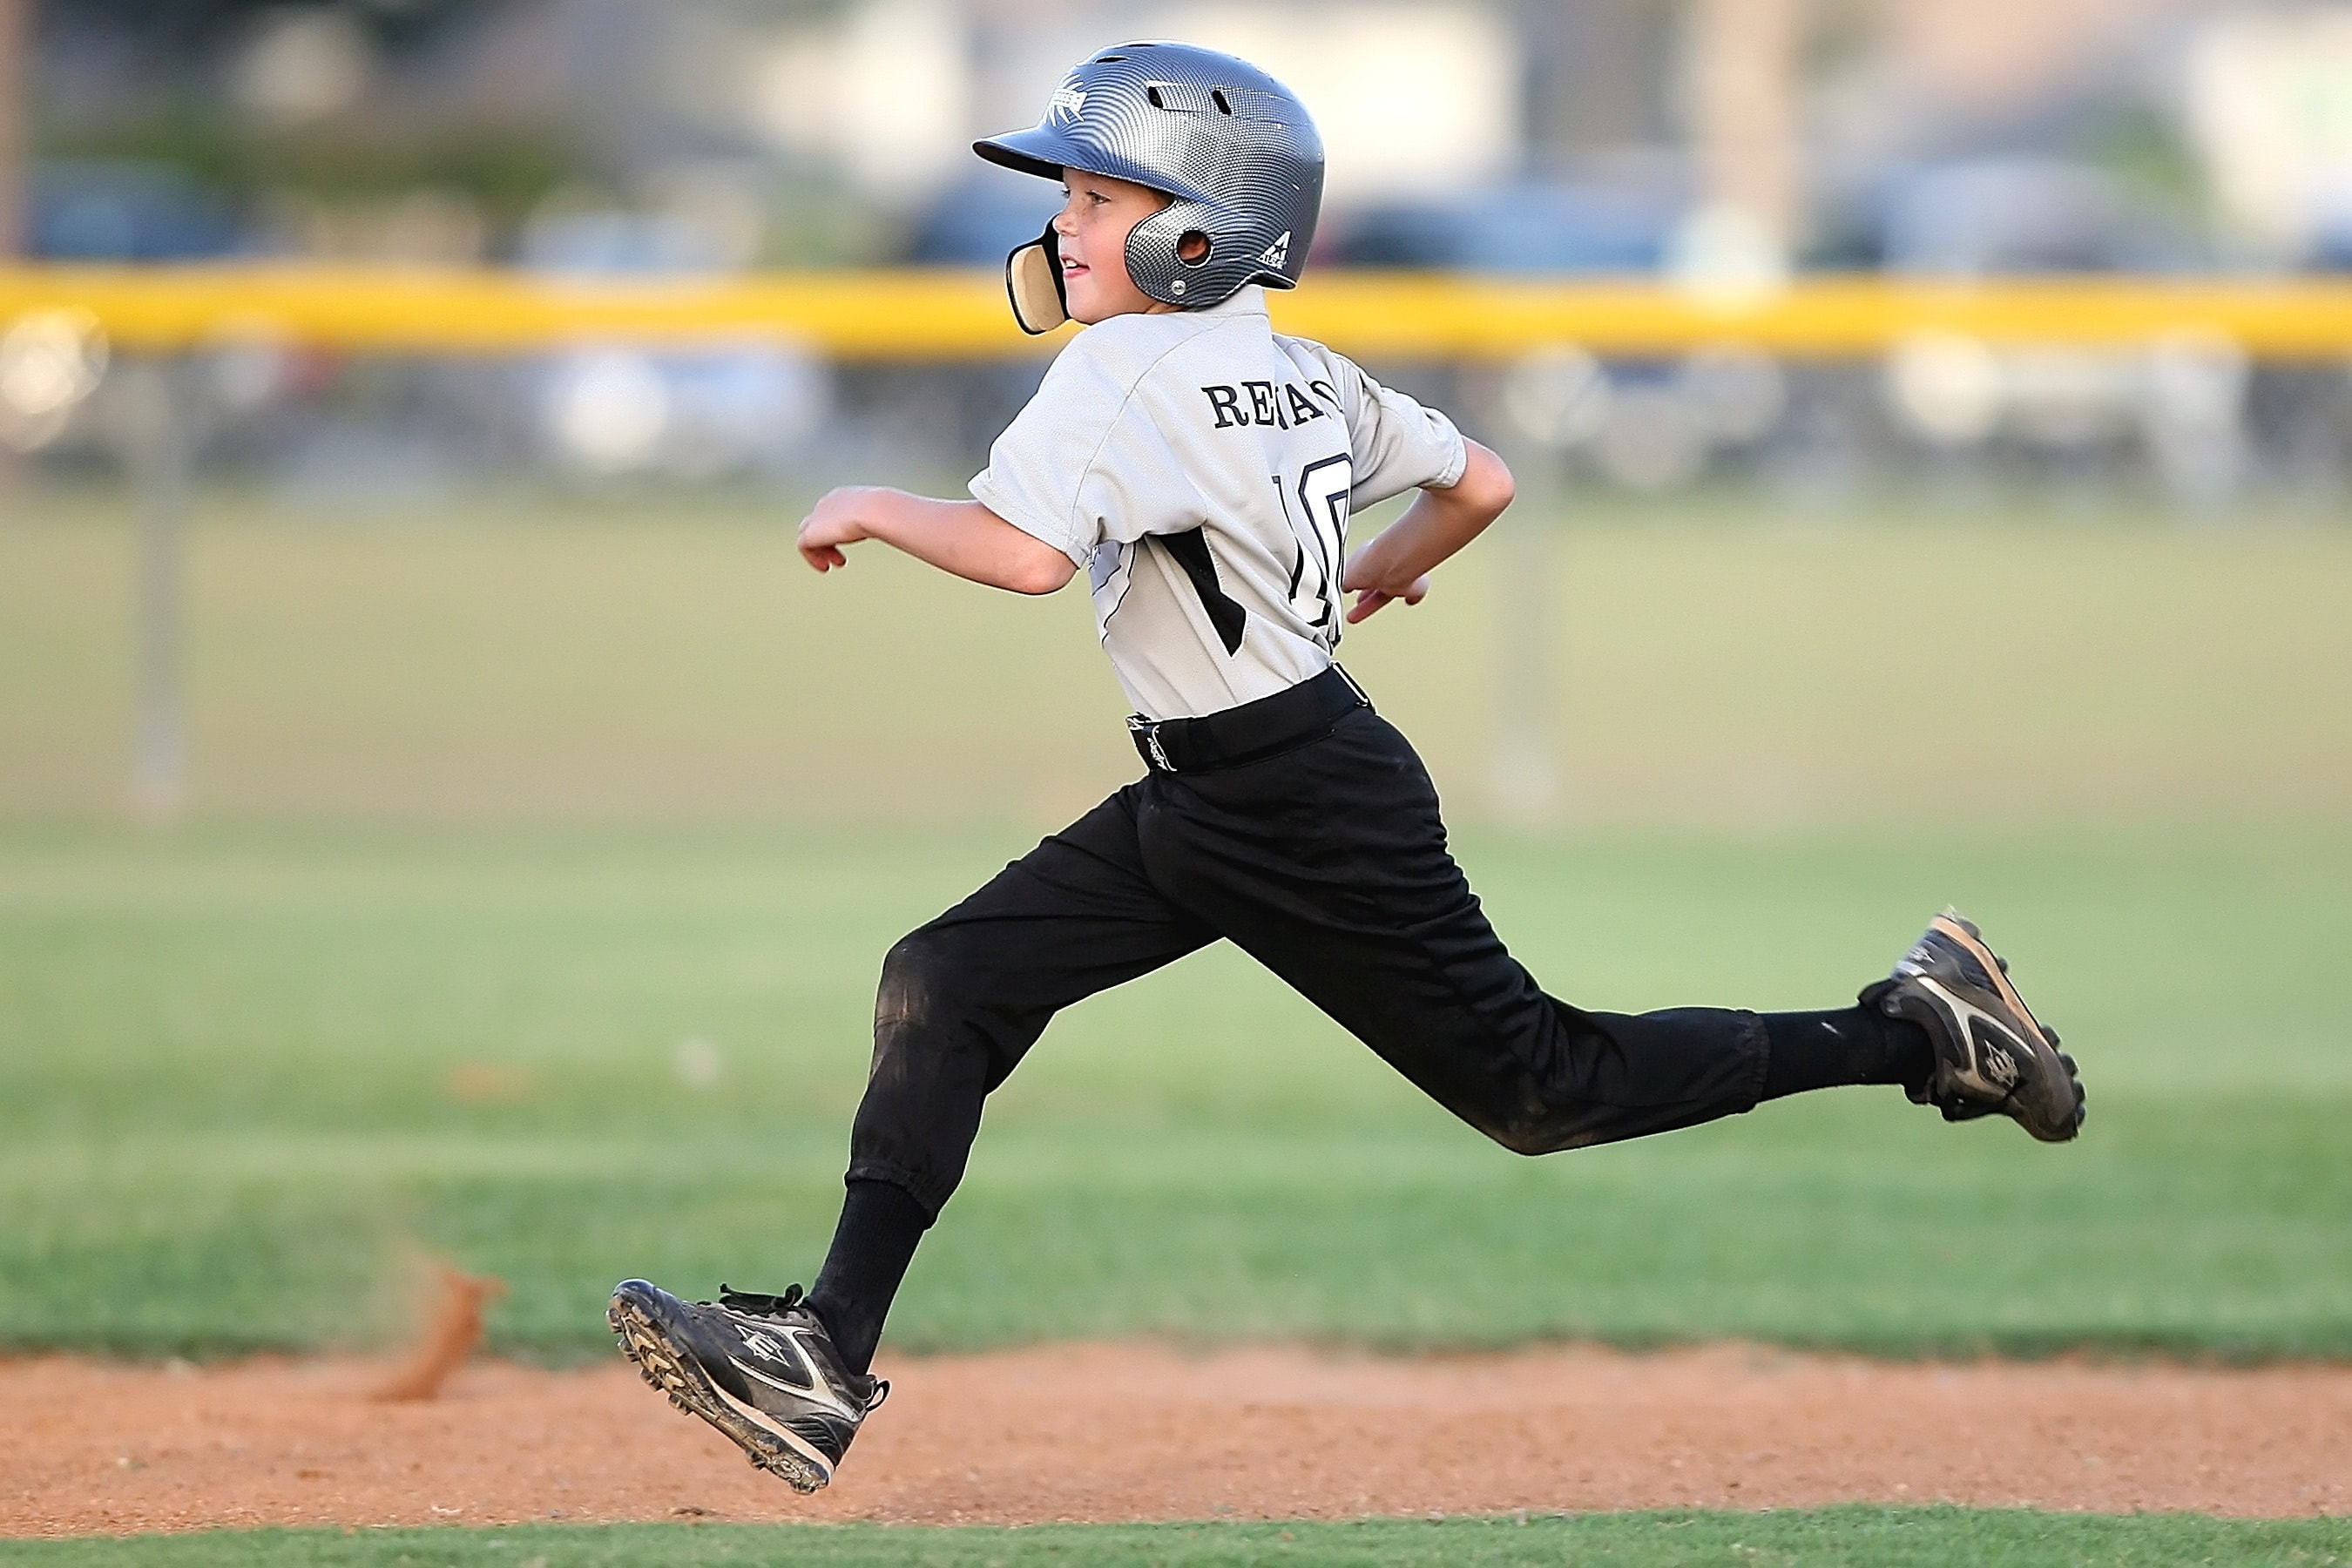 Young athlete at the baseball fields at Inspirada